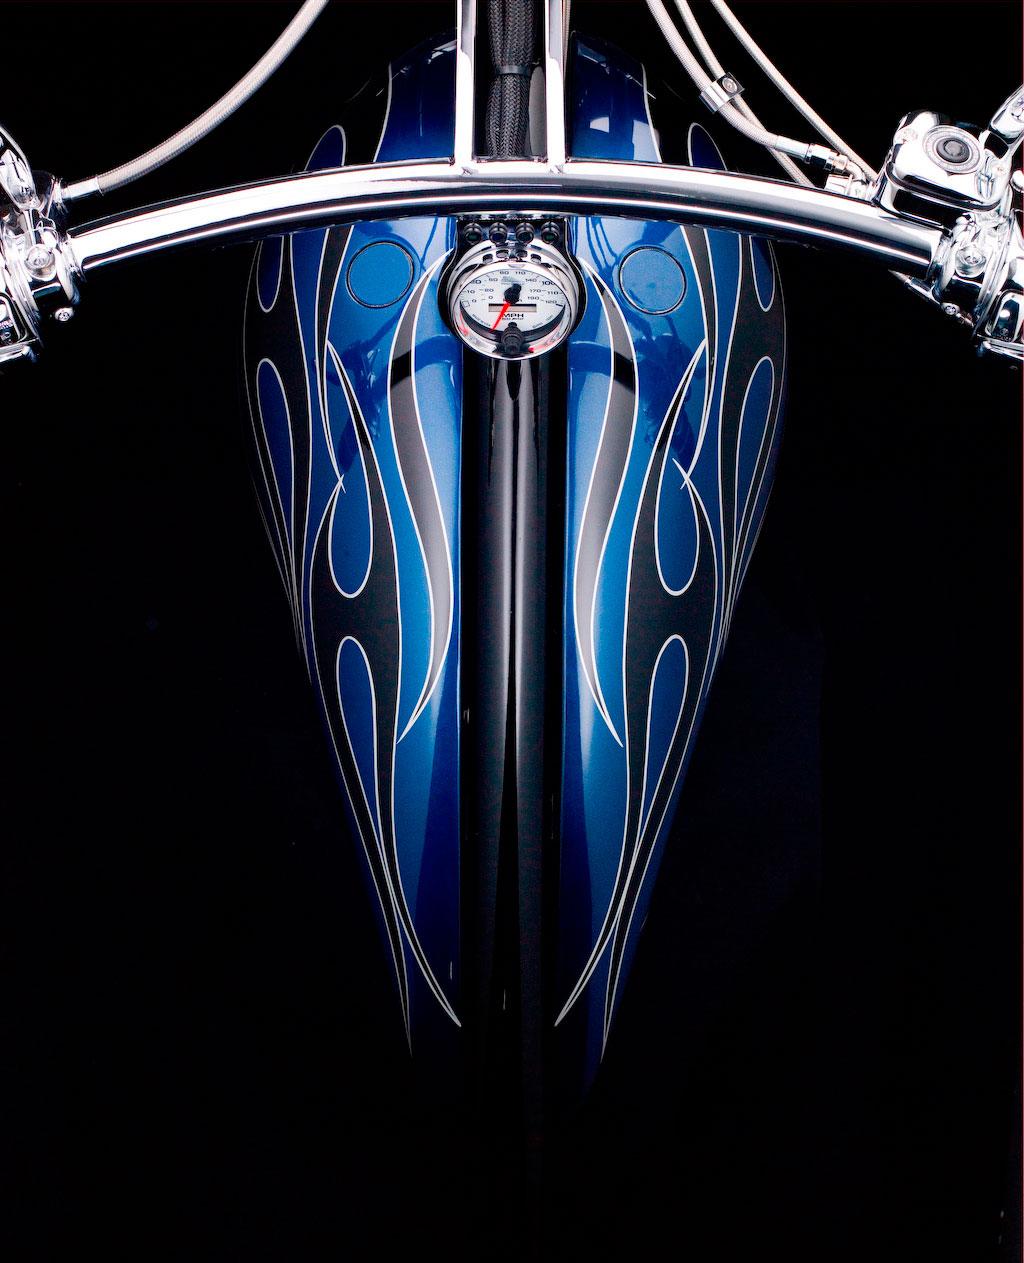 Rick Davis Photographic, Philadelphia, Still Life, Photography, Still Life Photography, Motorcycle, Automotive, Blue, Lifestyle, Motorsports, Engine